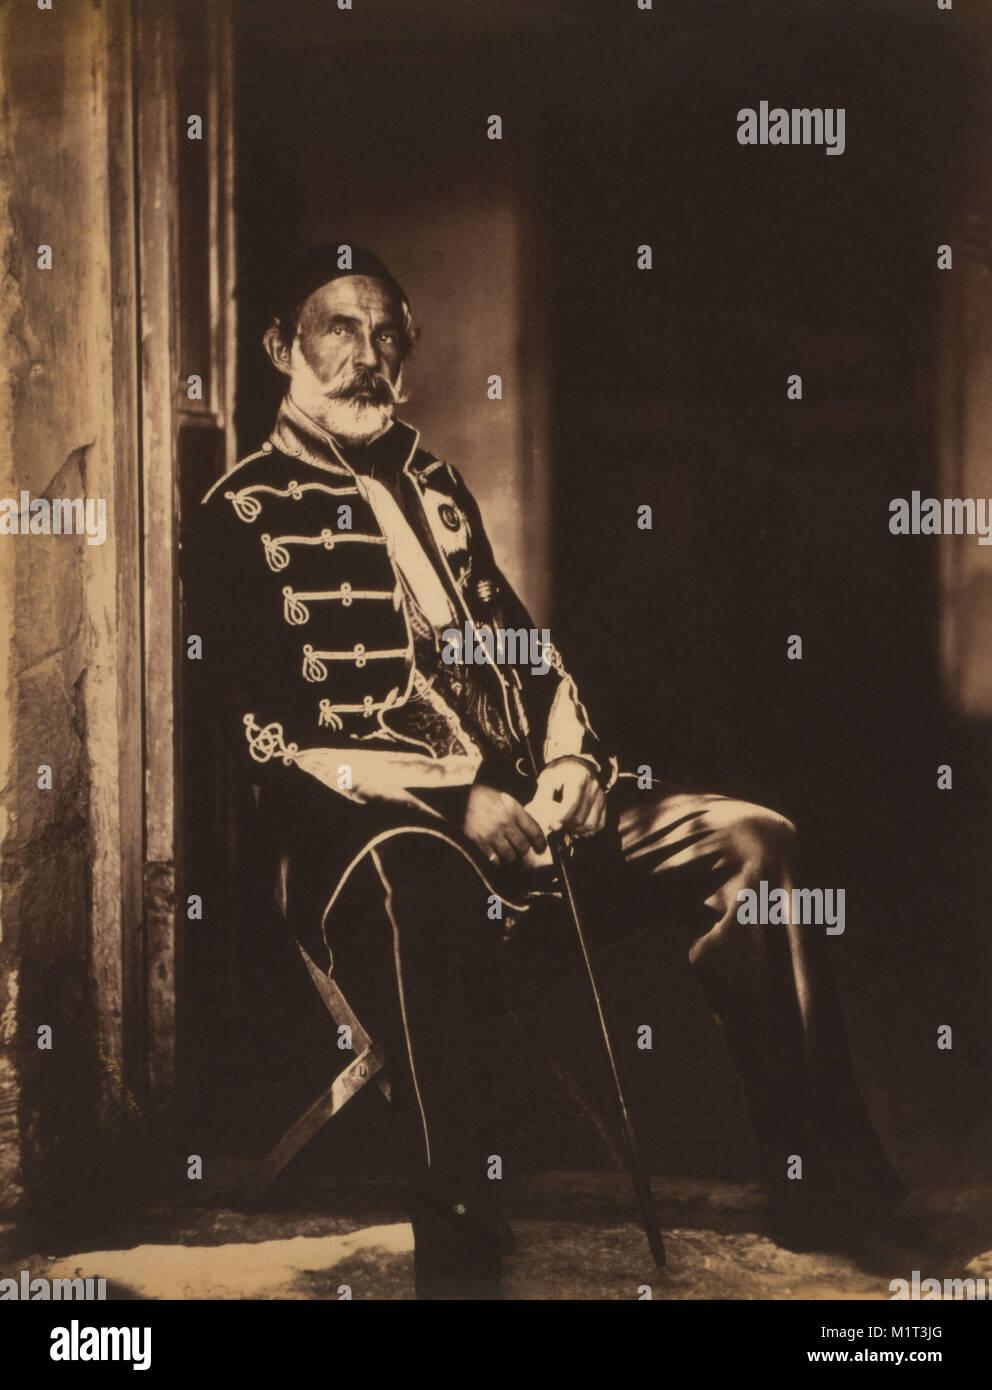 Ottoman Field Marshal Omar Pasha, Portrait Sitting in Doorway, Crimean War, Crimea, Ukraine, by Roger Fenton, 1855 - Stock Image